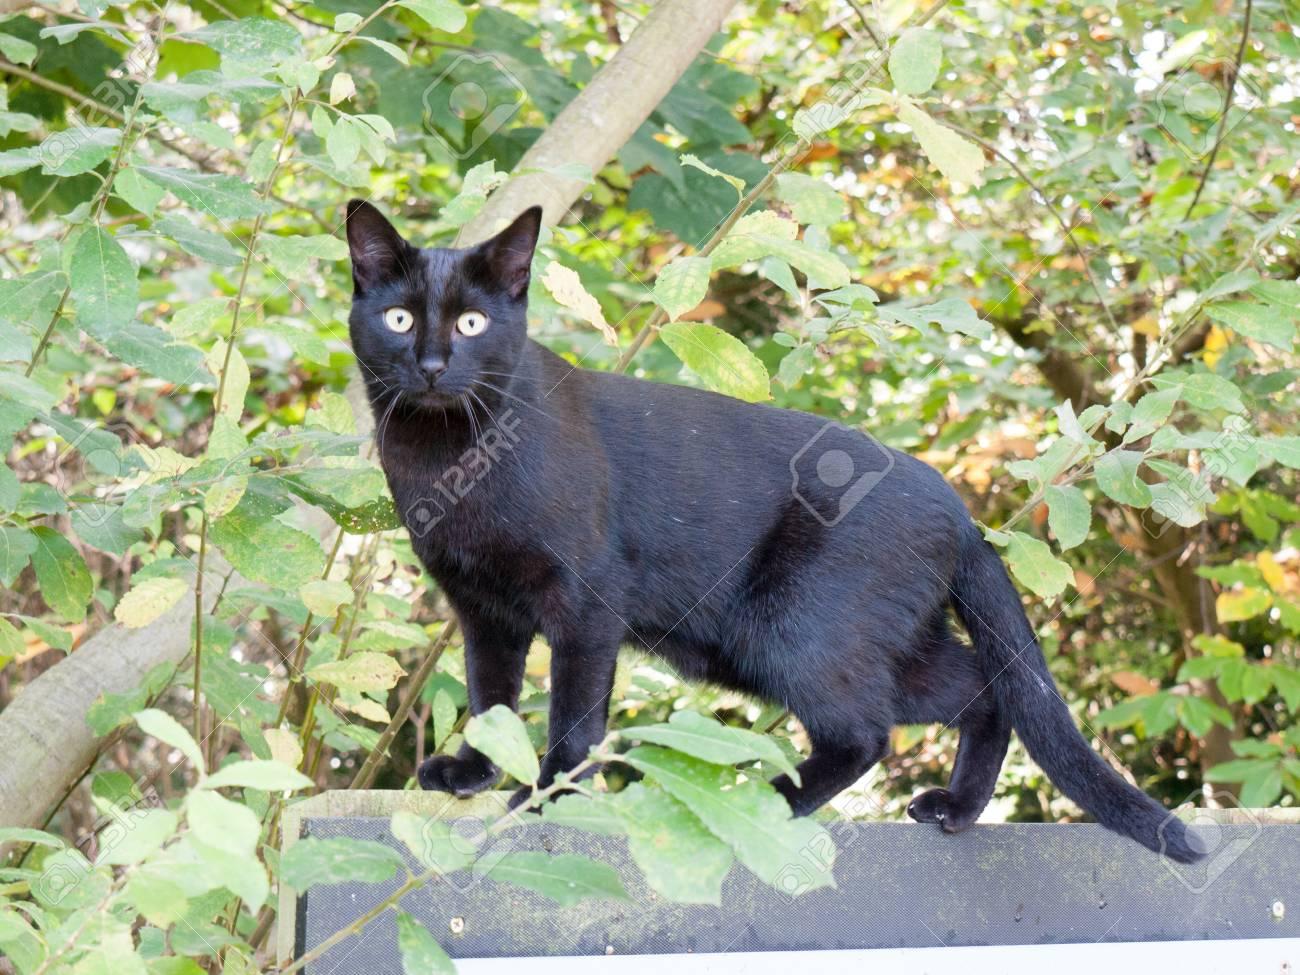 Black Cat Facing Camera Green Eyes Cute Adorable Close Up Essex